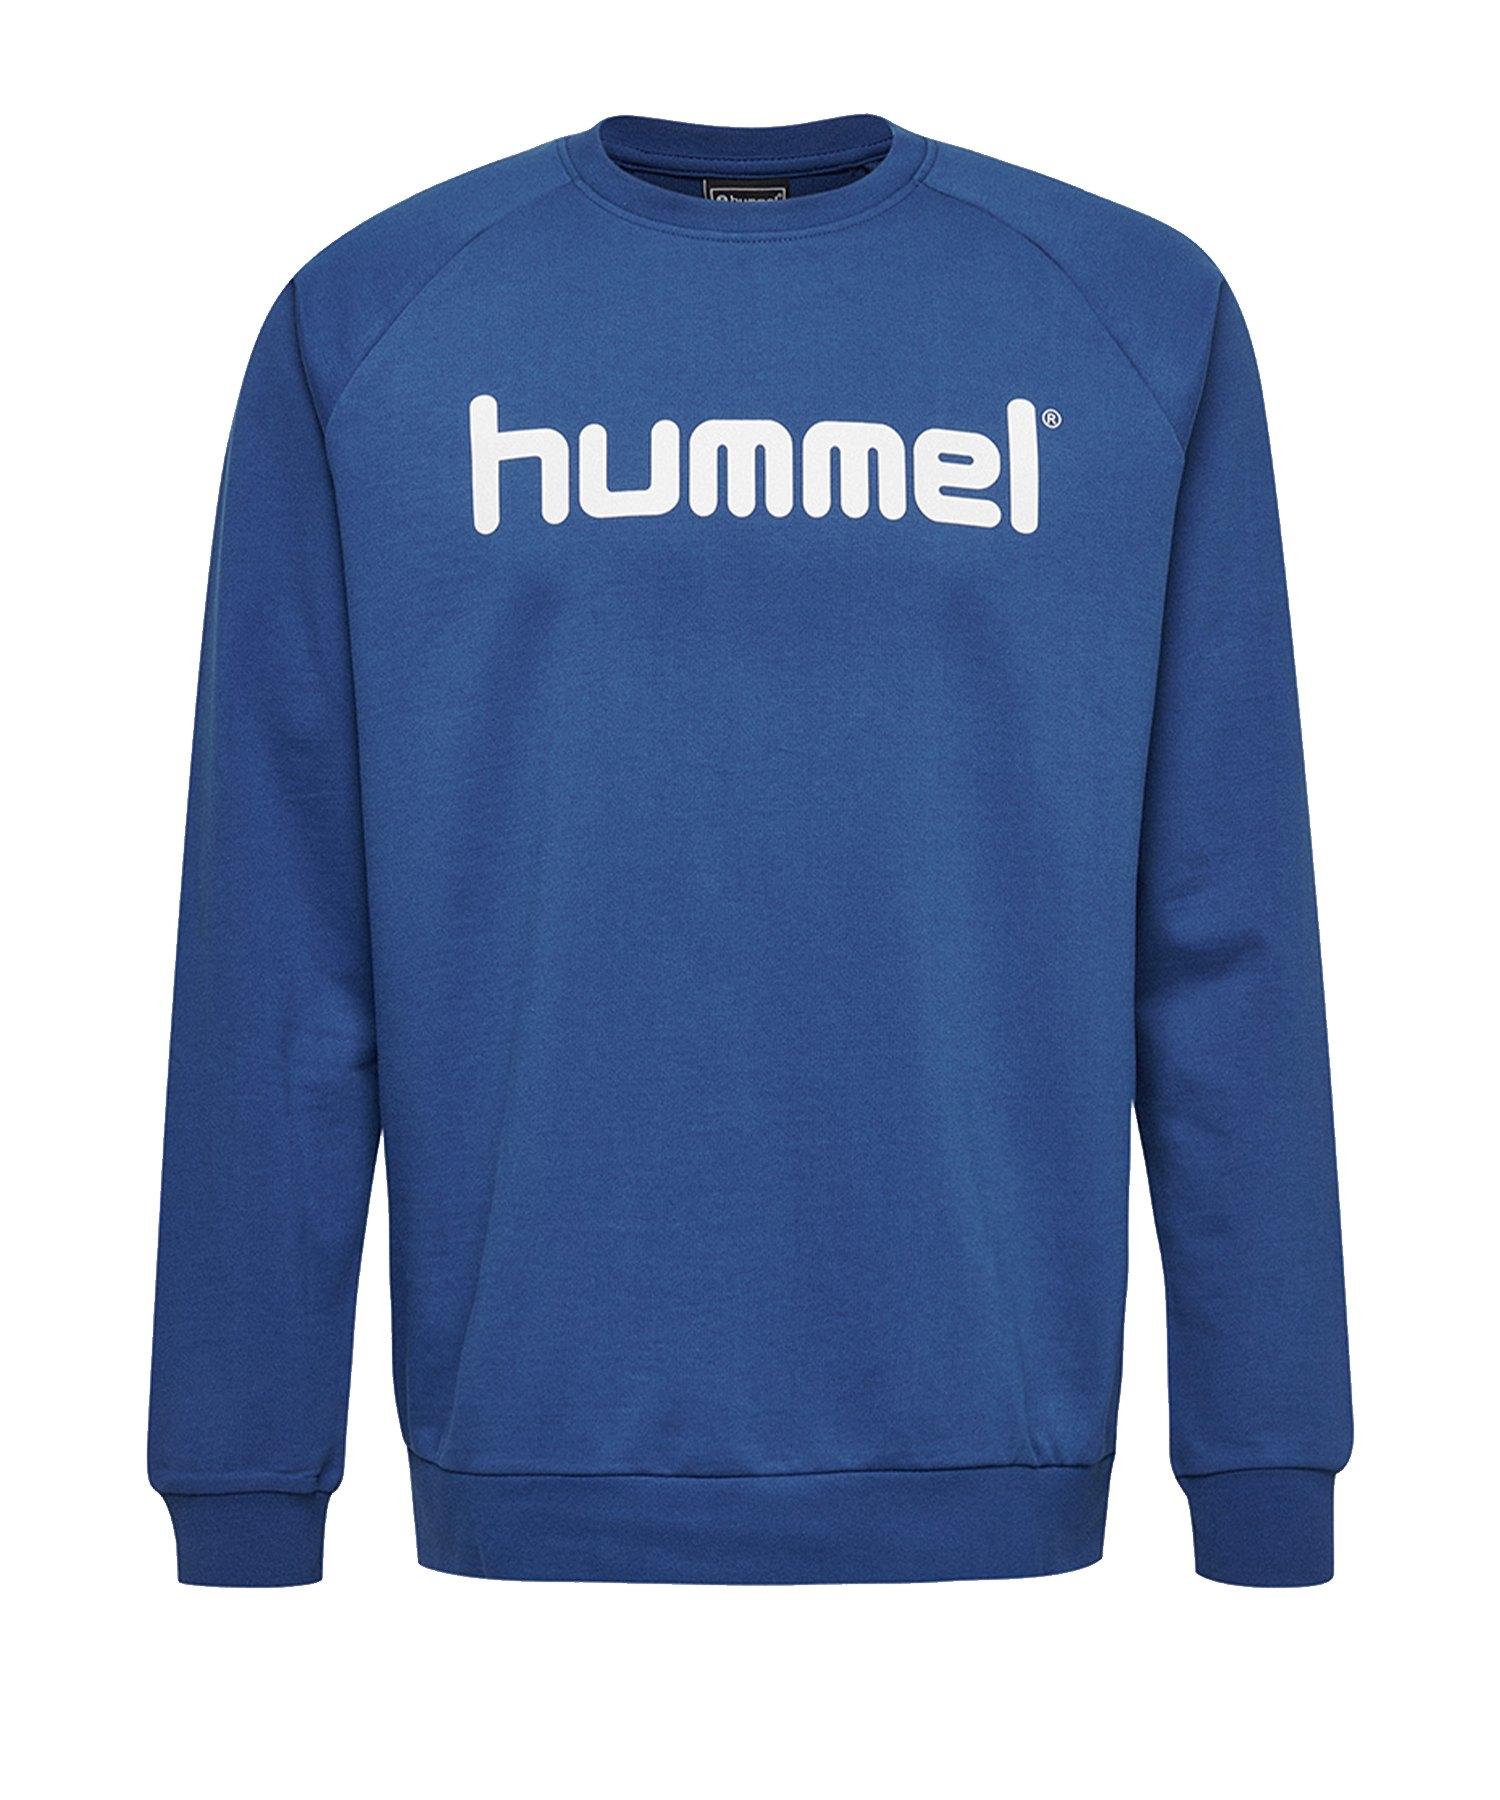 Hummel Cotton Logo Sweatshirt Blau F7045 - Blau